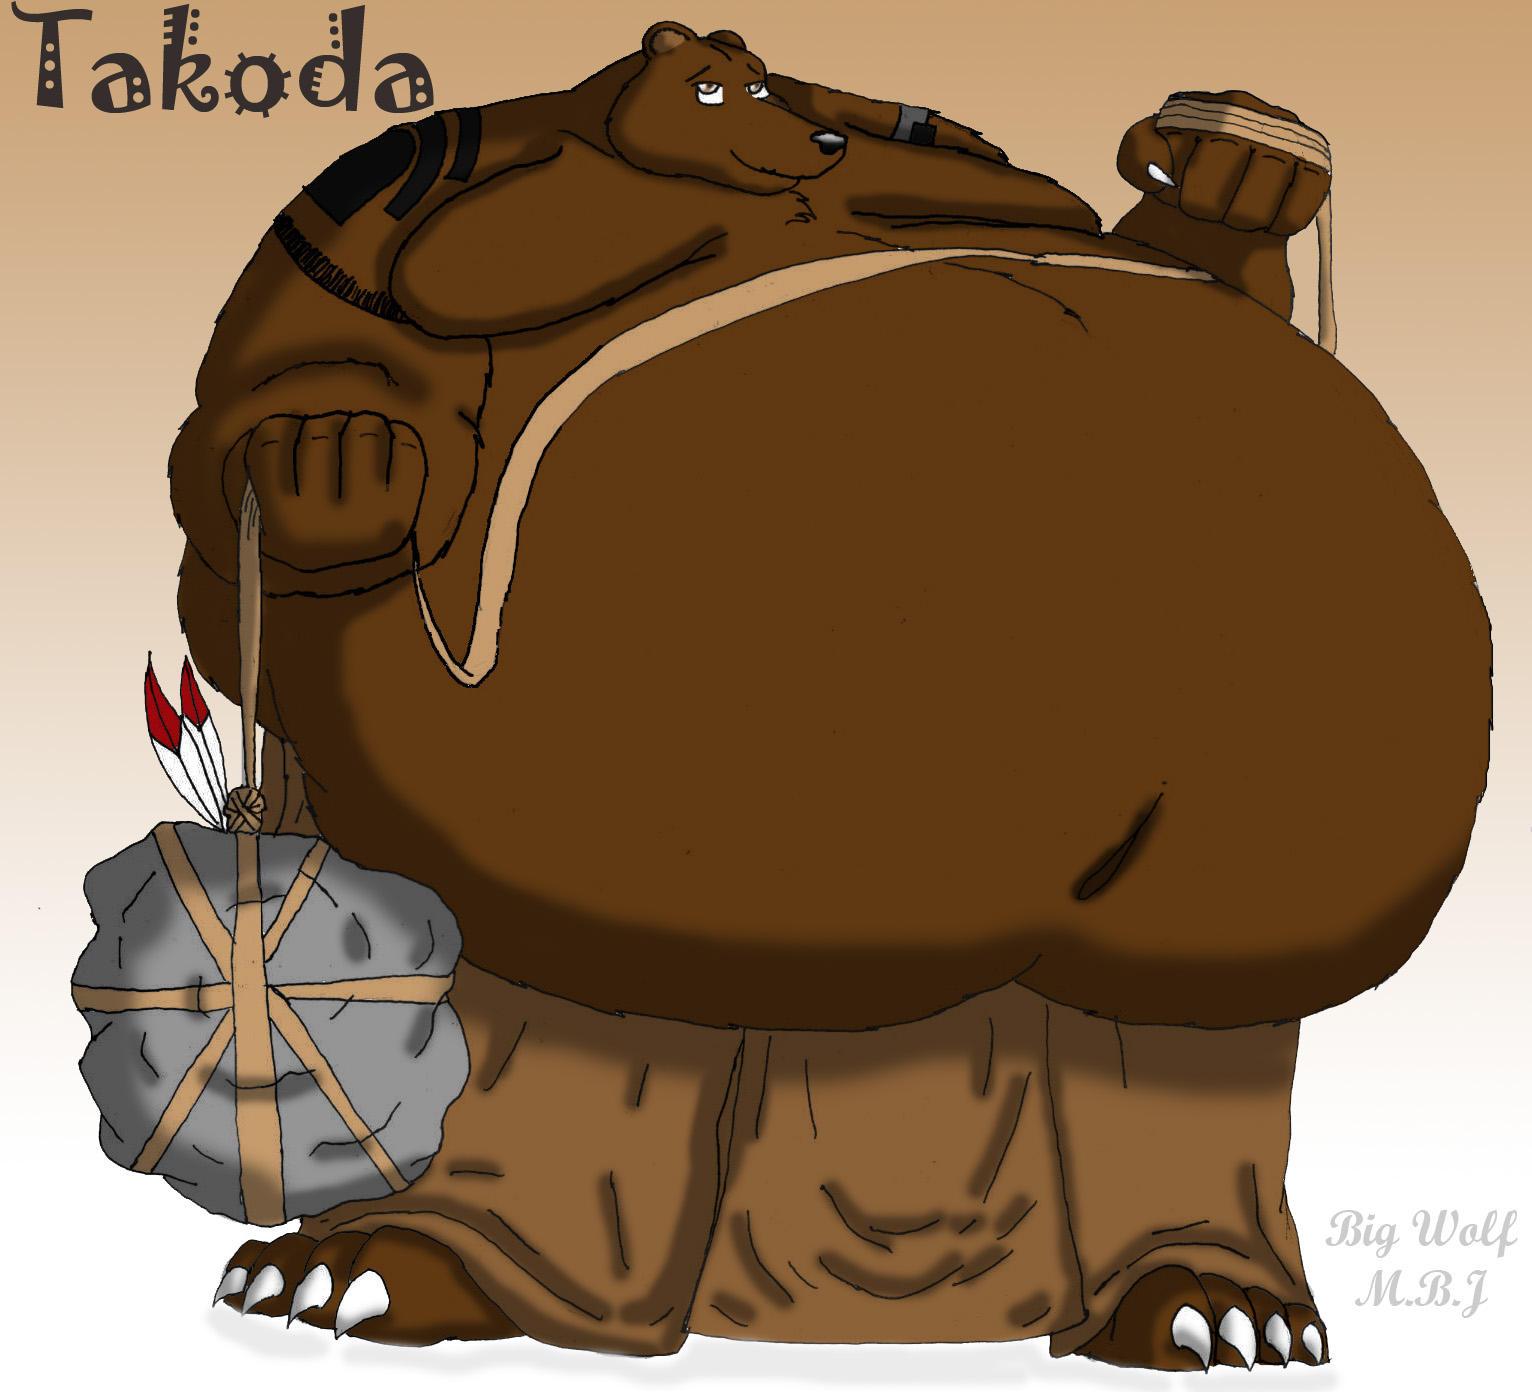 gay big fat bear: